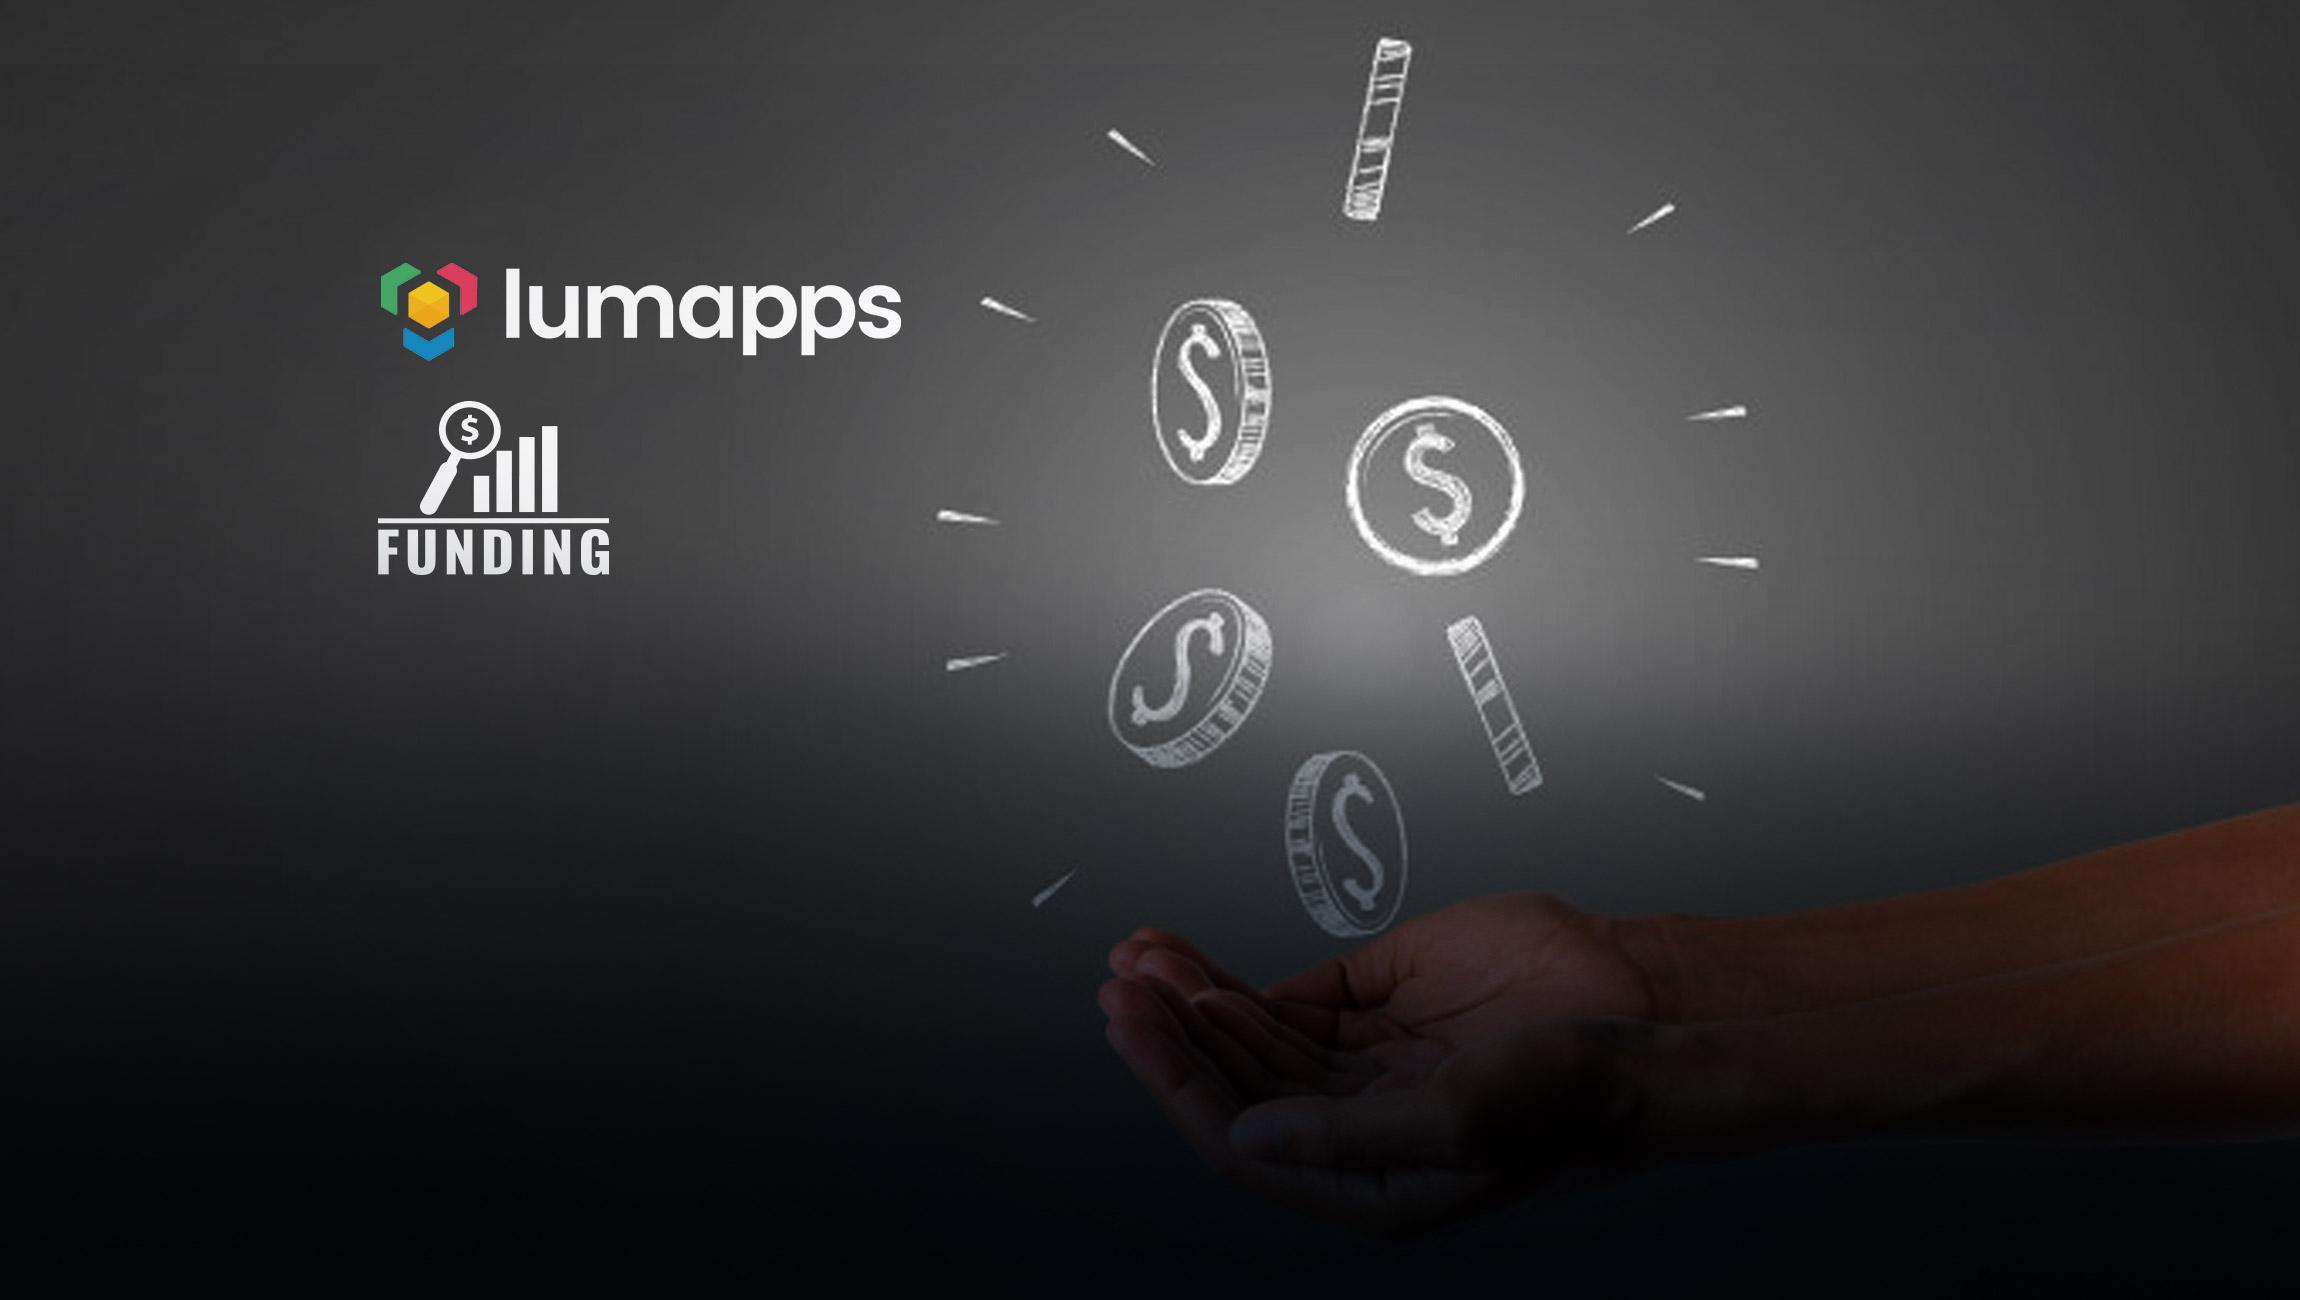 Communication Solutions Provider LumApps Raises $70 Million in Series C Funding